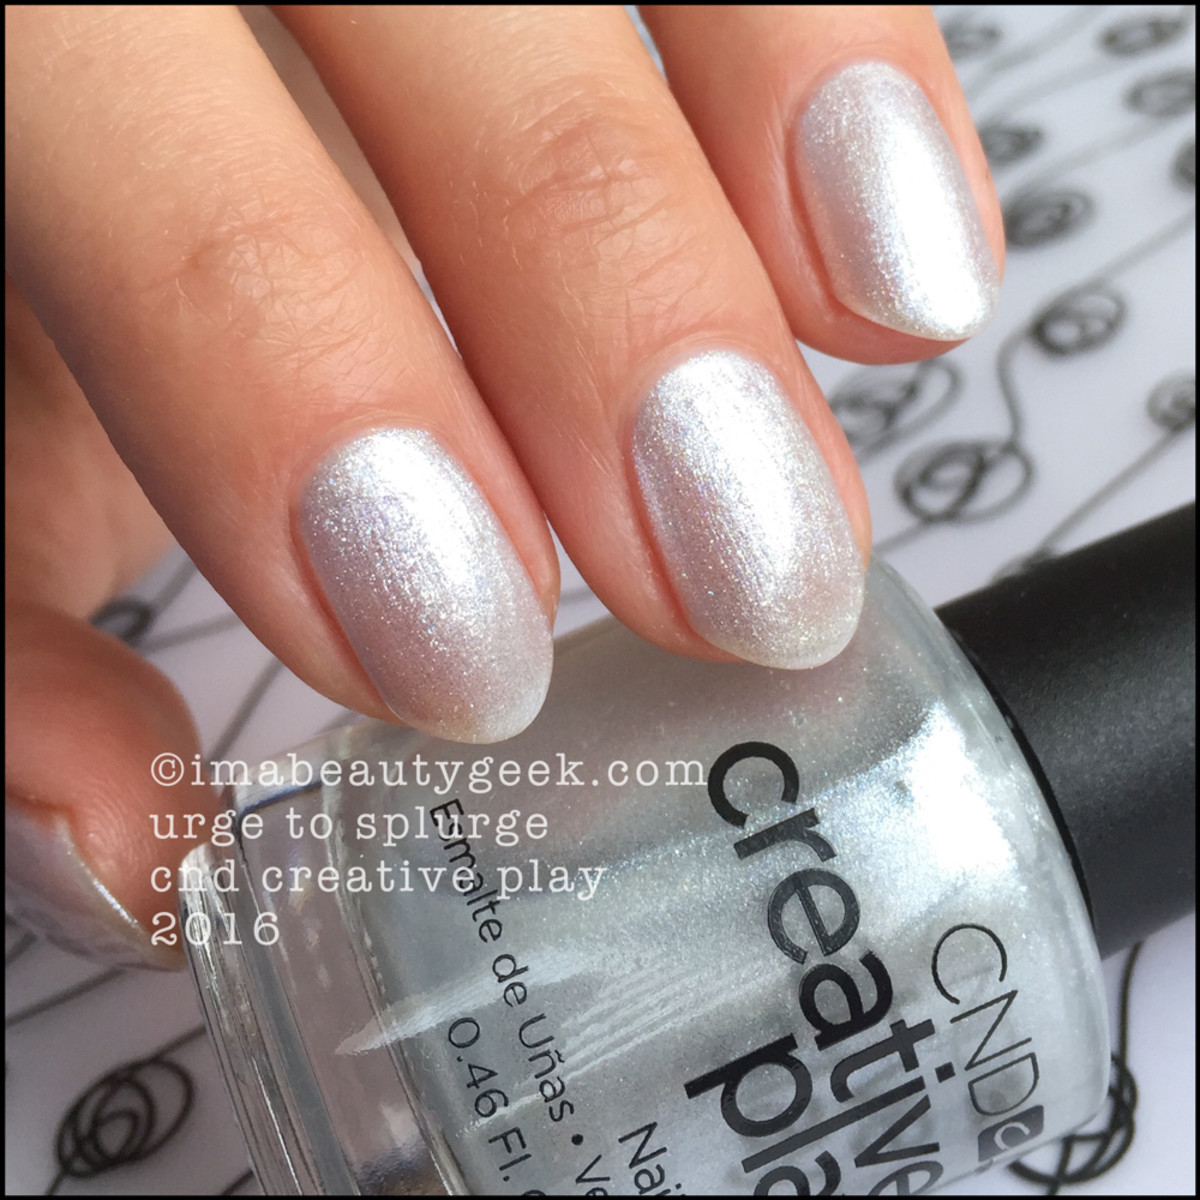 CND Creative Play Urge to Splurge_CND Creative Play Nail Polish Swatches